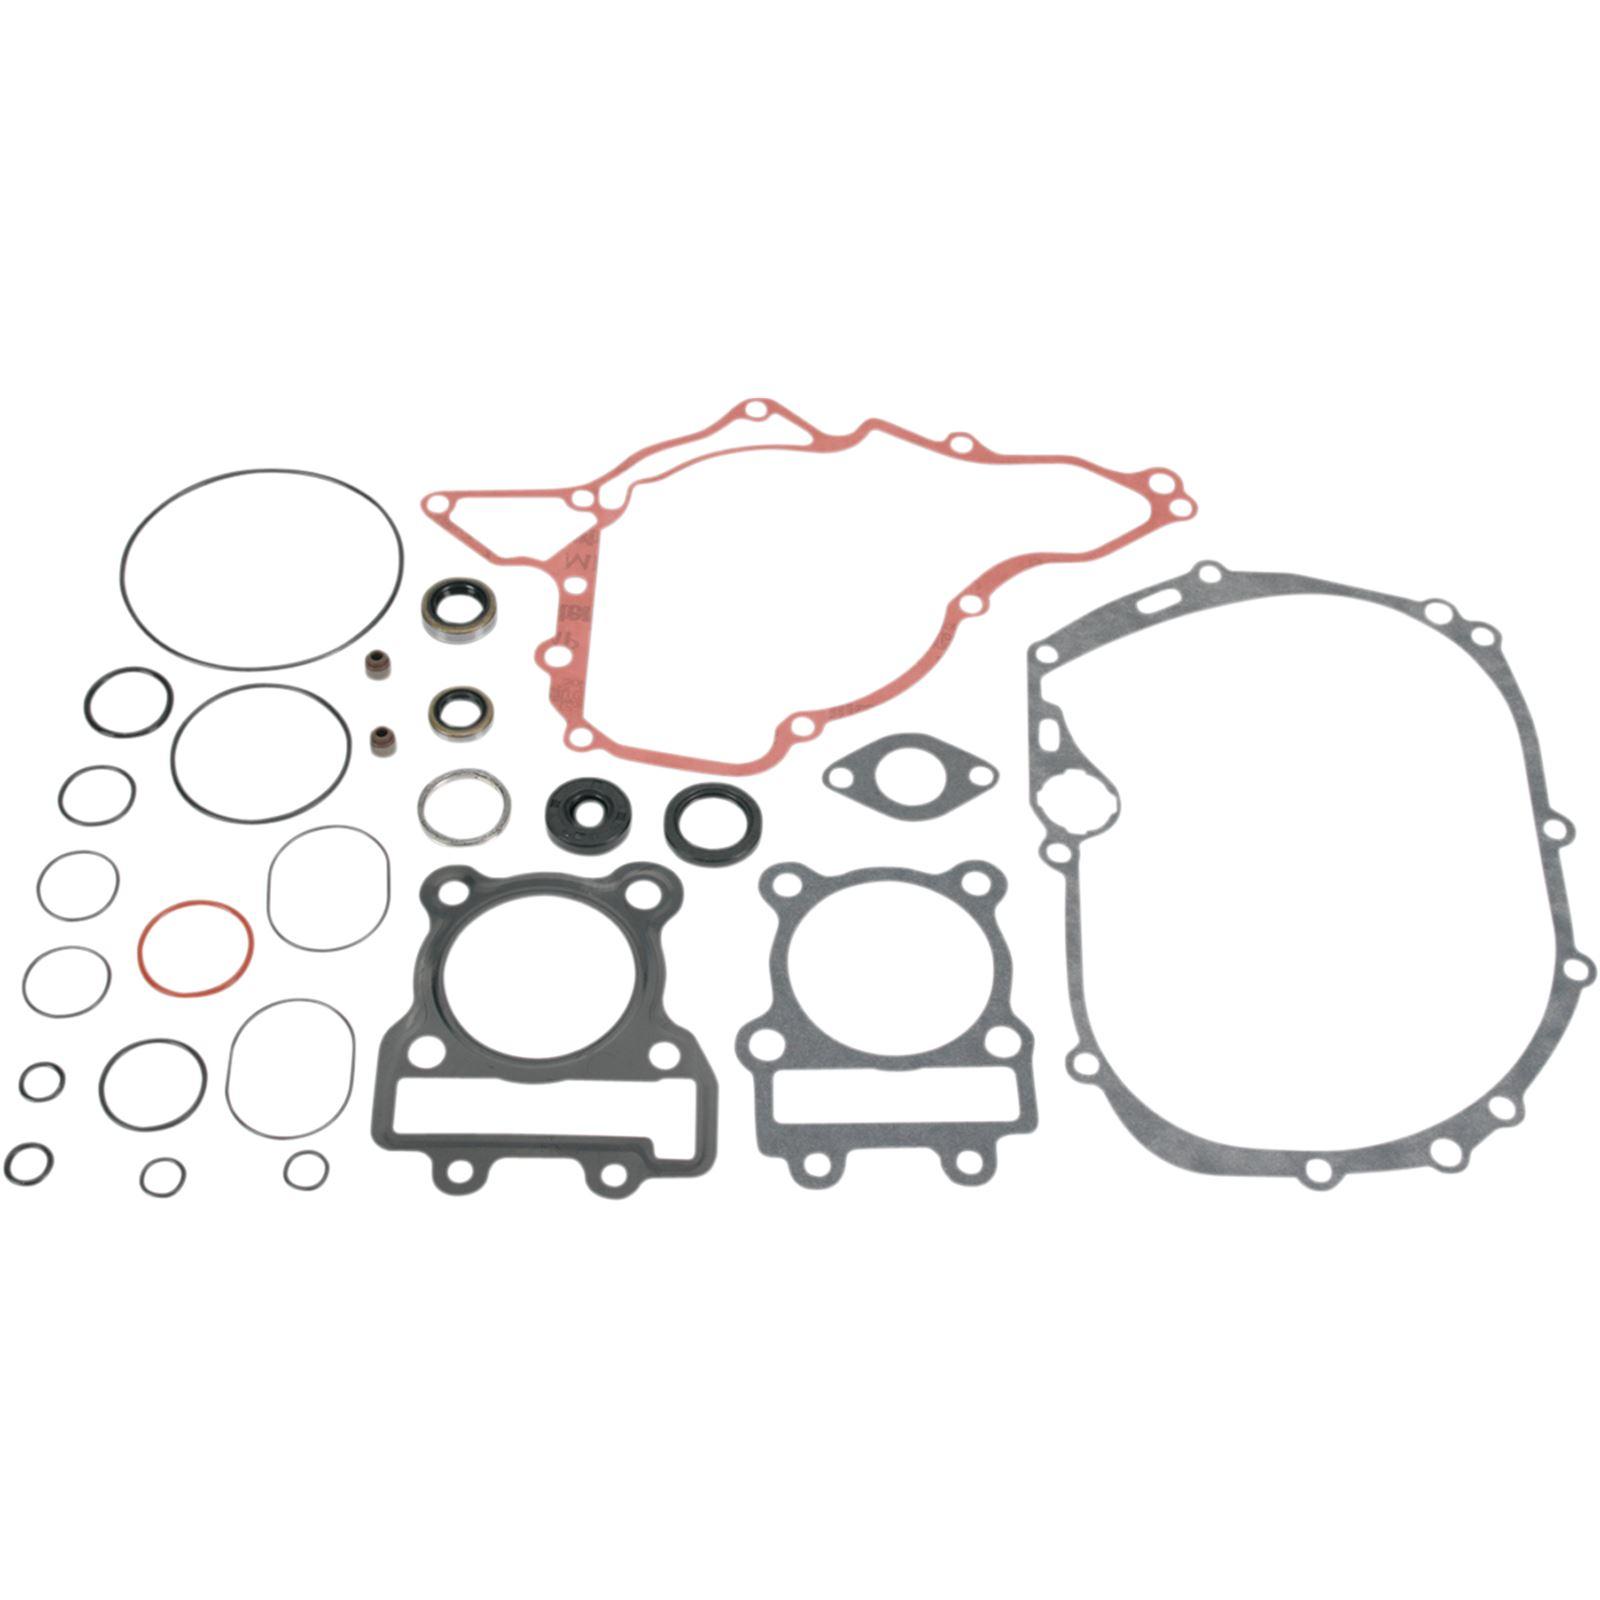 Moose Racing Motor Gasket Kit with Seal KLR/DRZ110